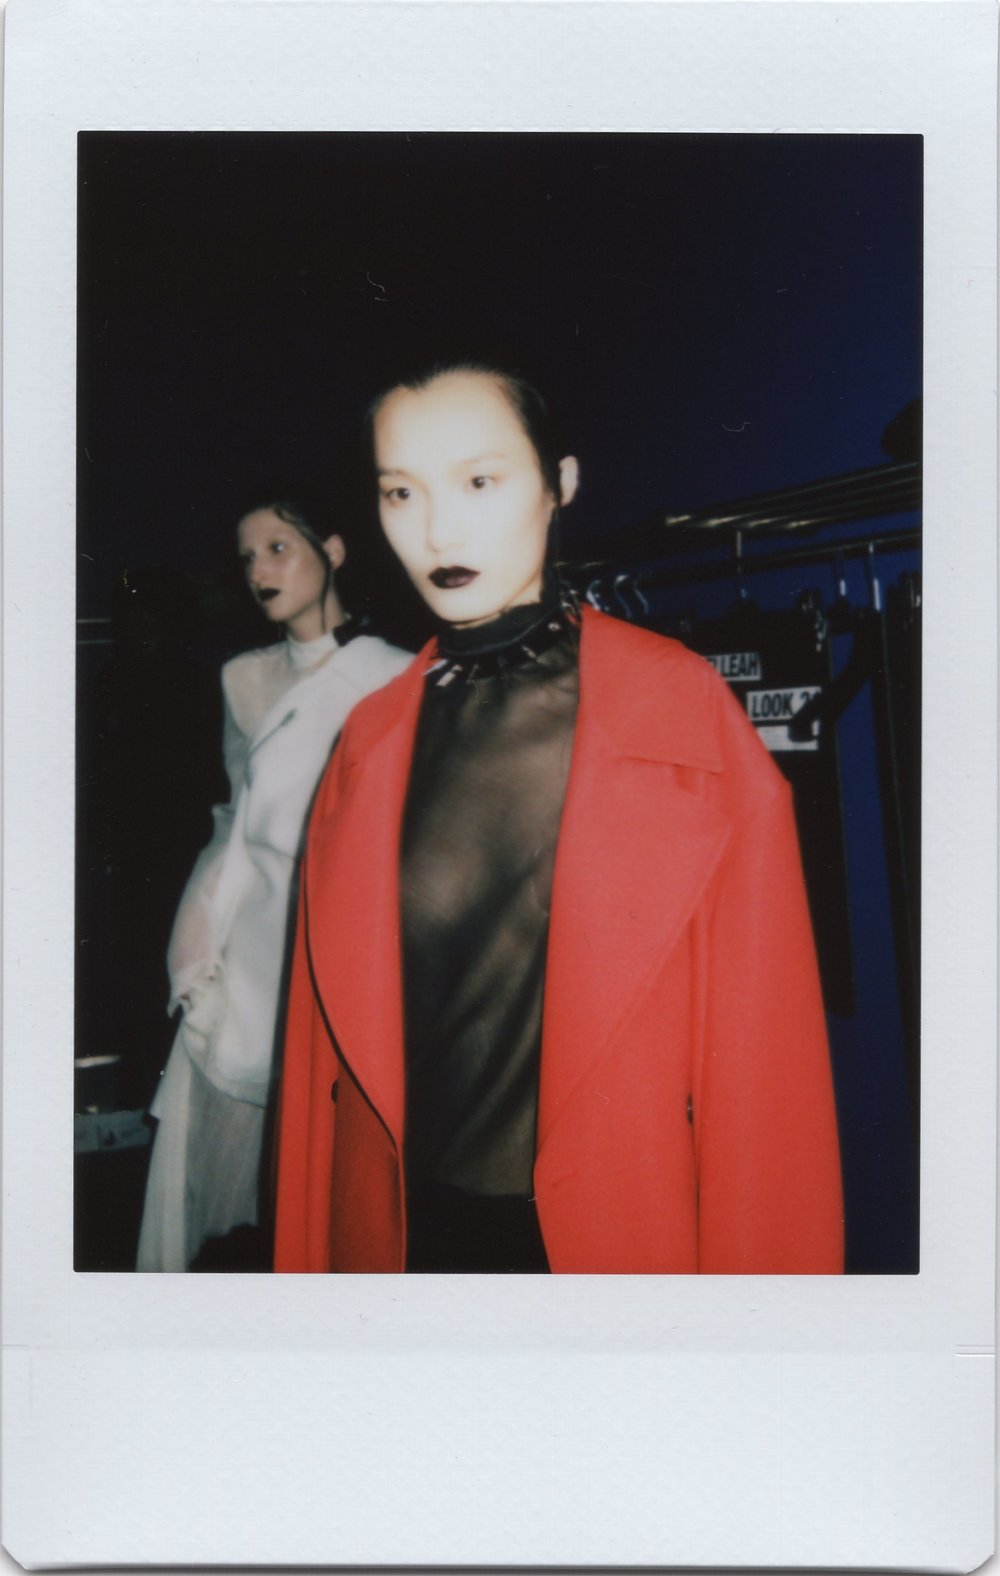 YangLi_Honigschreck_Backstage_Polaroid_4.jpg